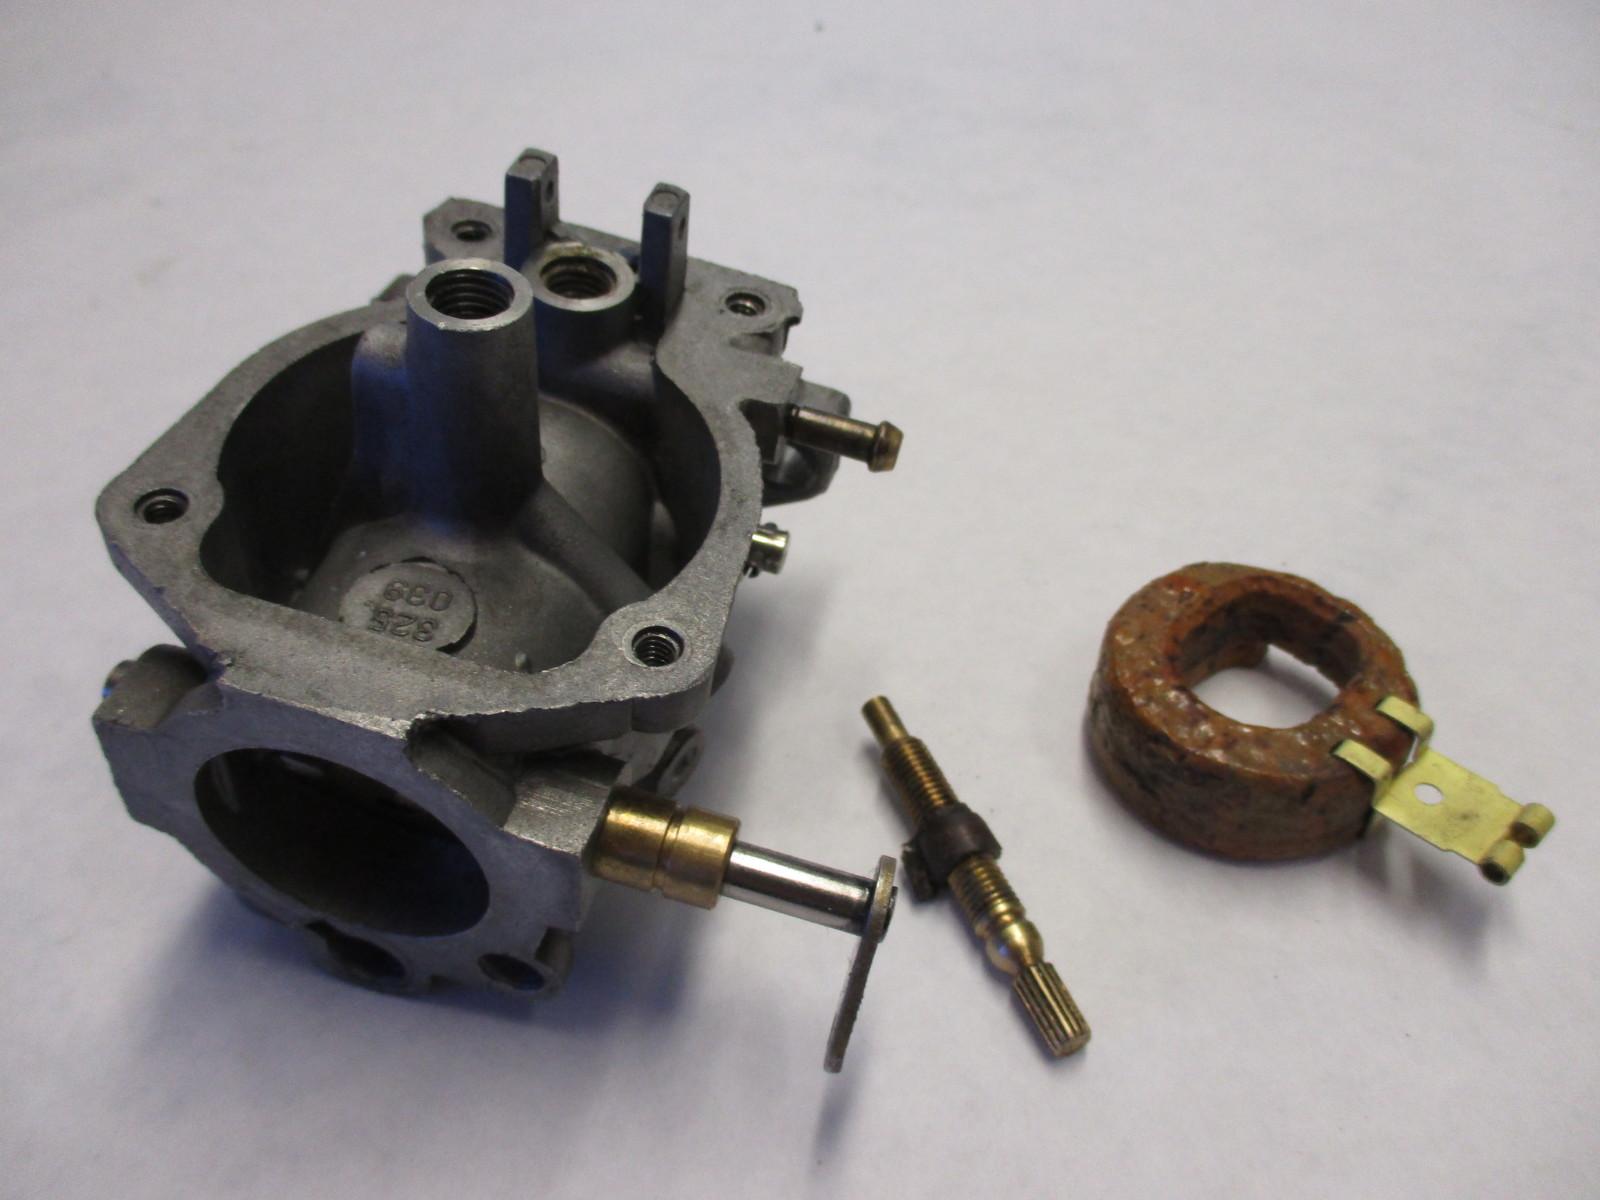 0395139 evinrude johnson carburetor parts only 395139 for Parts johnson outboard motors